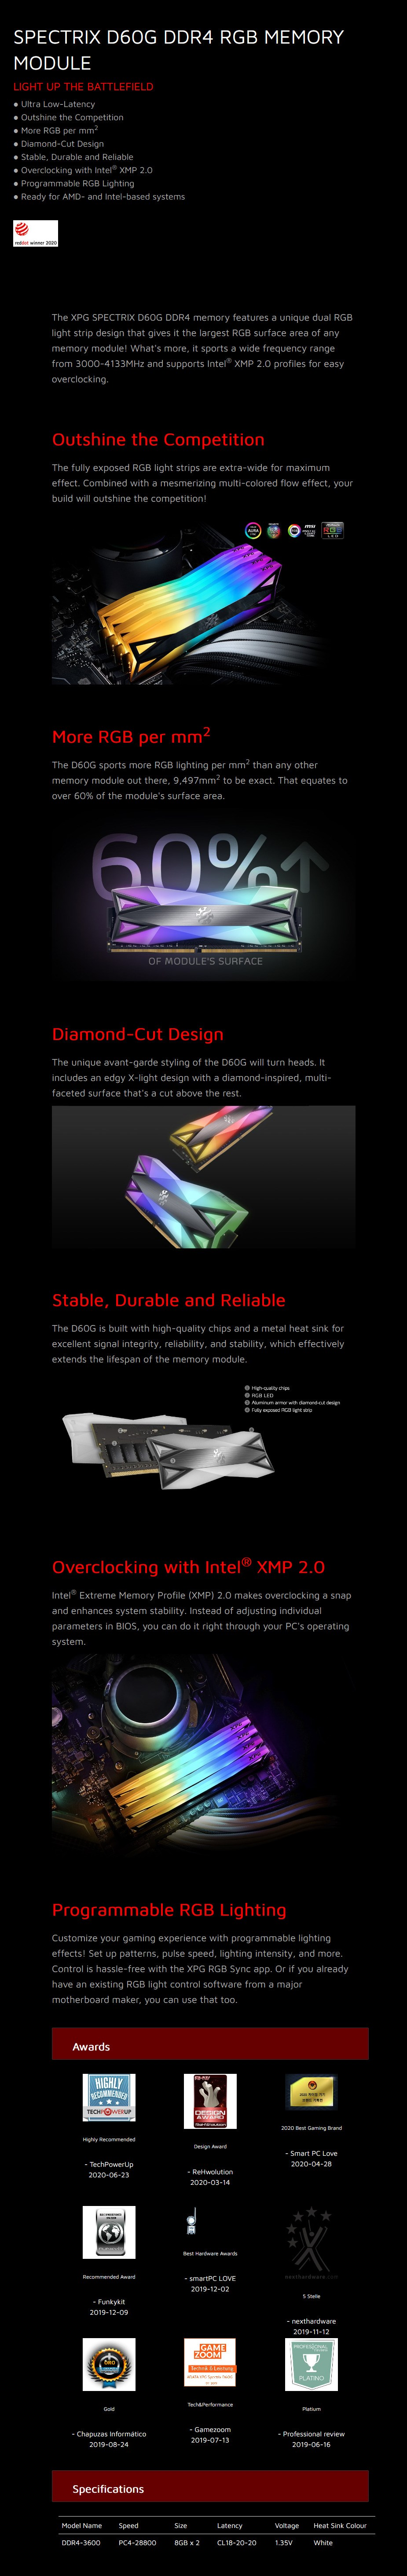 ADATA XPG Spectrix D60G 16GB (2x 8GB) DDR4 3600MHz RGB Memory - White - Overview 1